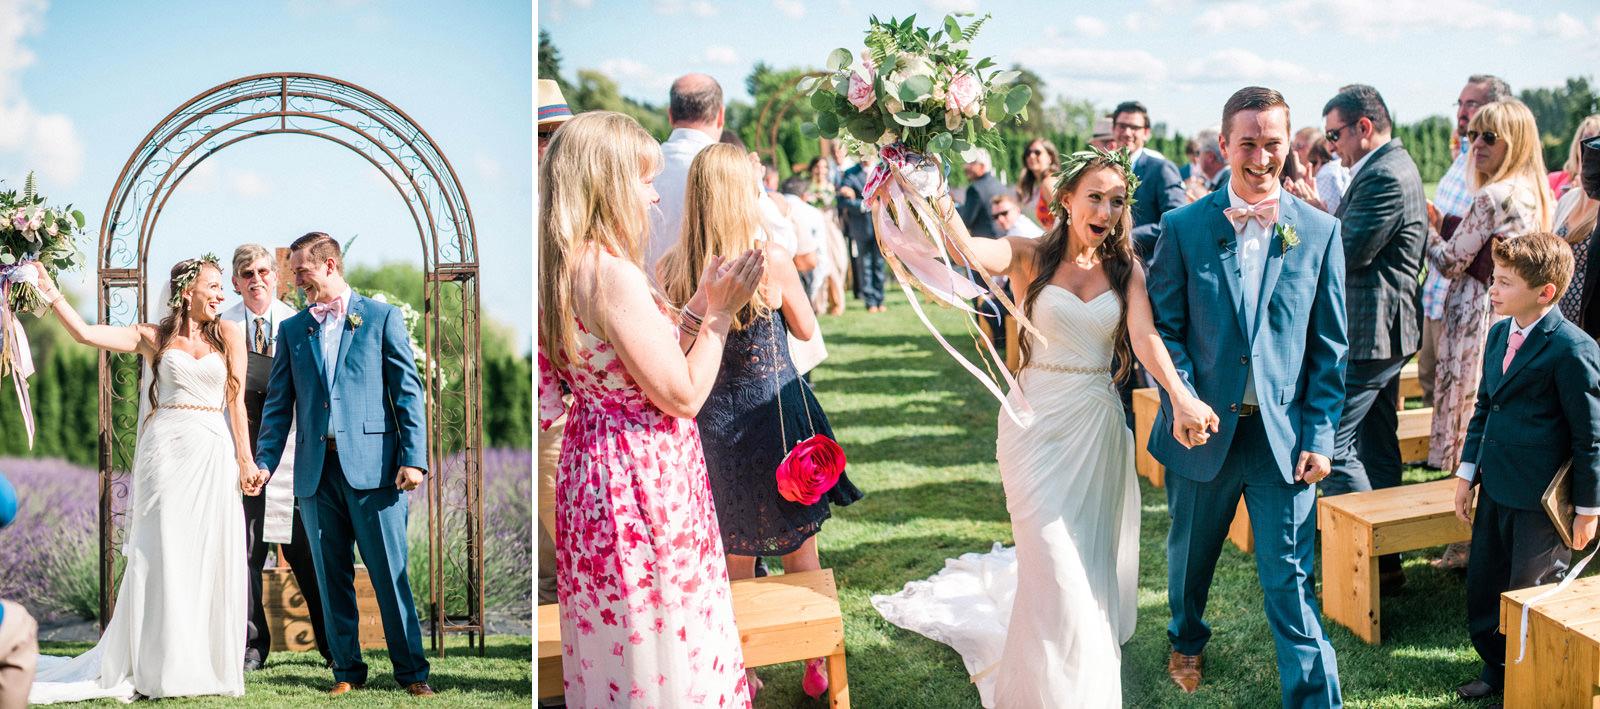 047-woodinville-lavendar-farm-wedding-with-golden-glowy-photos.jpg